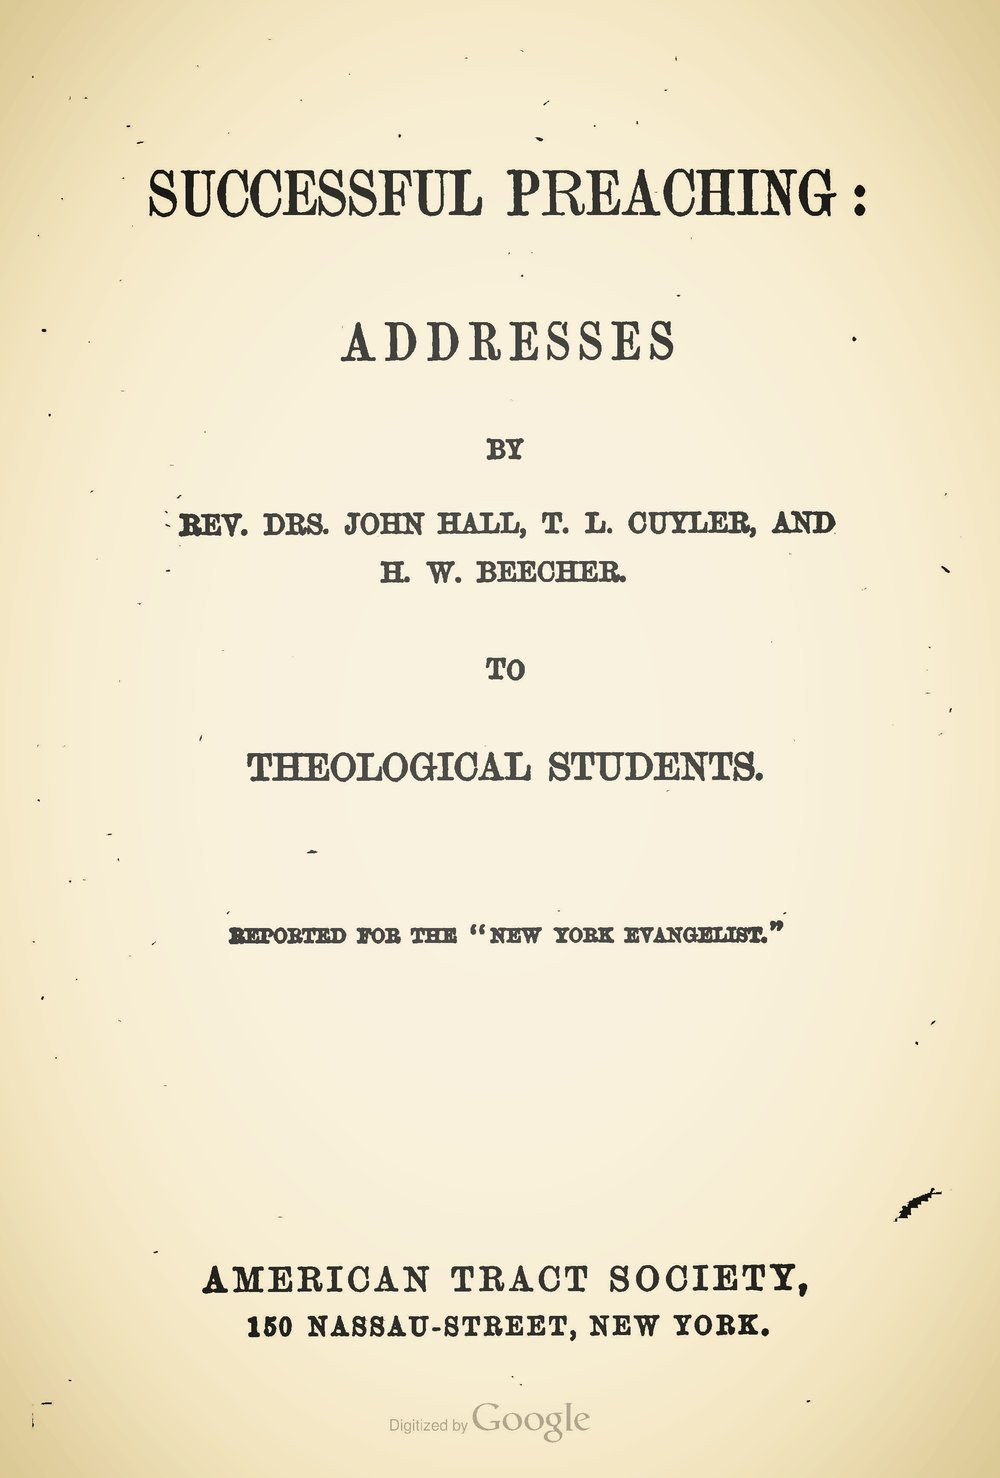 Hall, John, Successful Preaching Title Page.jpg